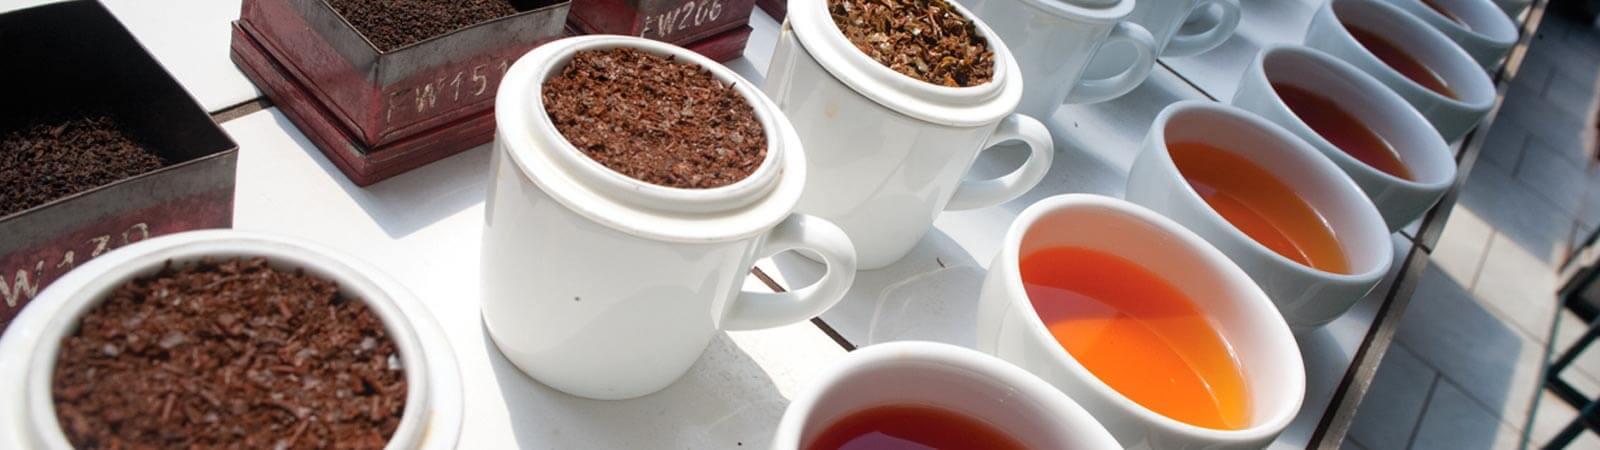 Superior quality Ceylon tea by MJF Exports